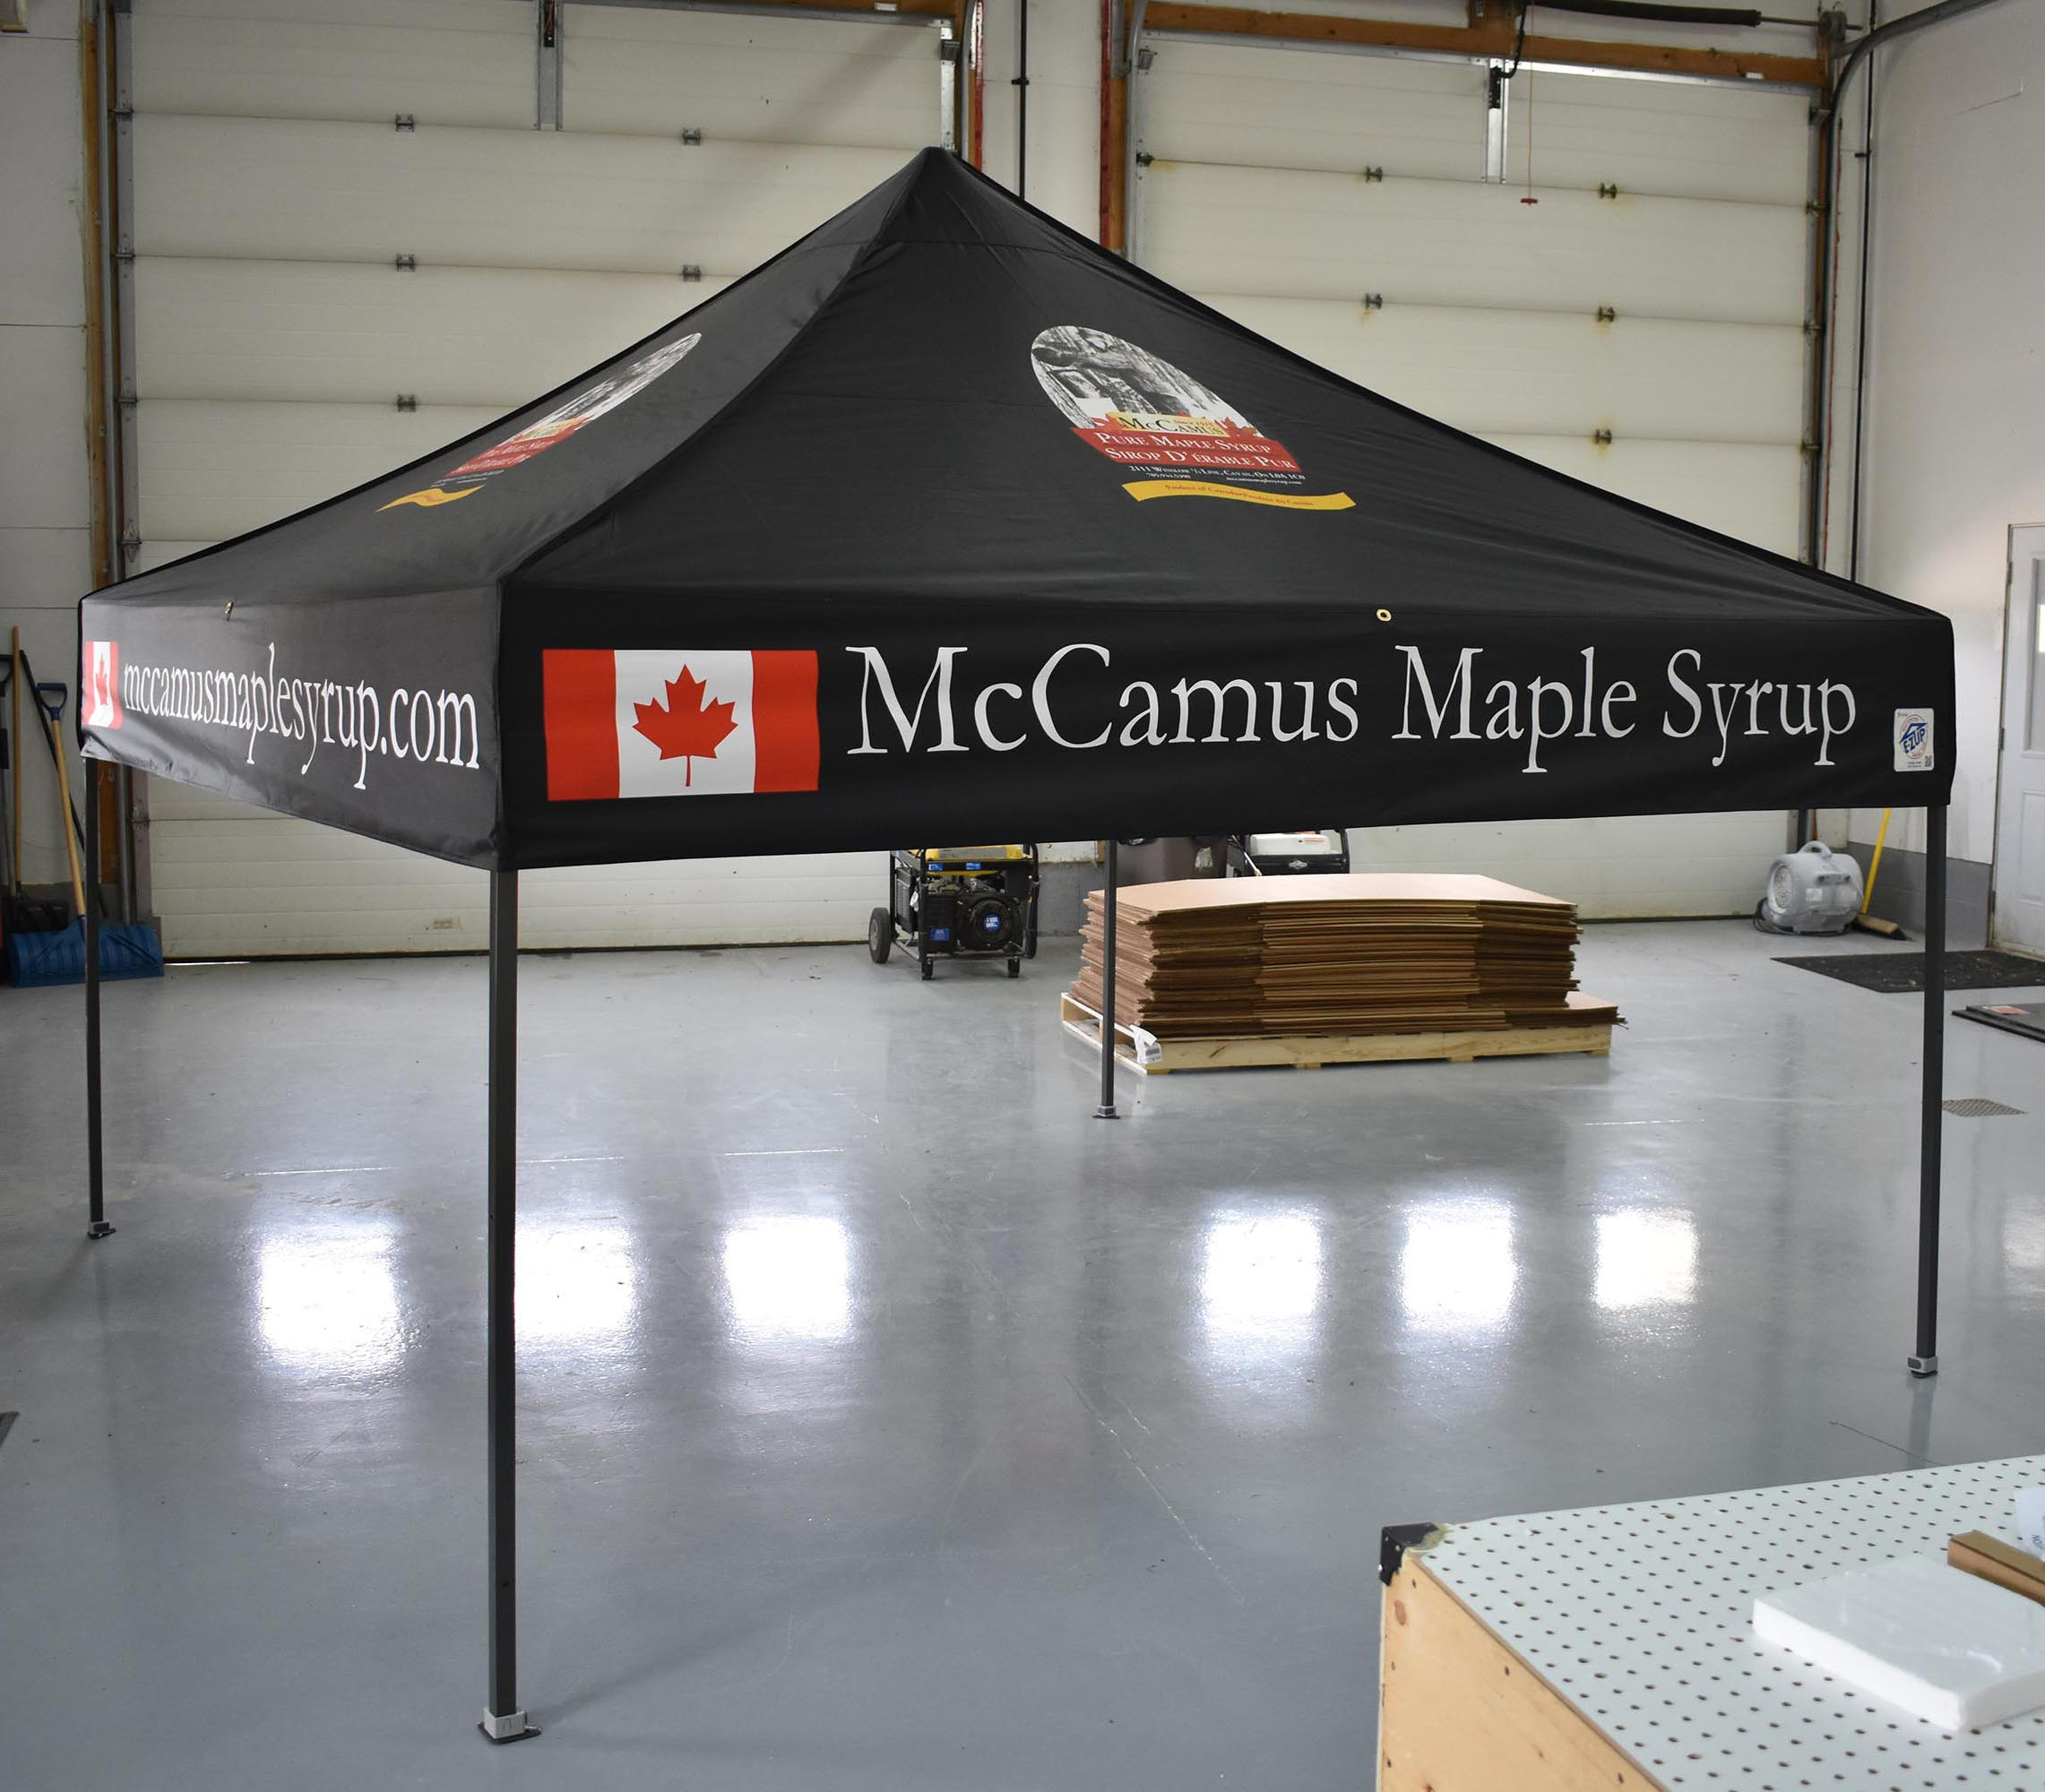 McCamus Maple Syrup